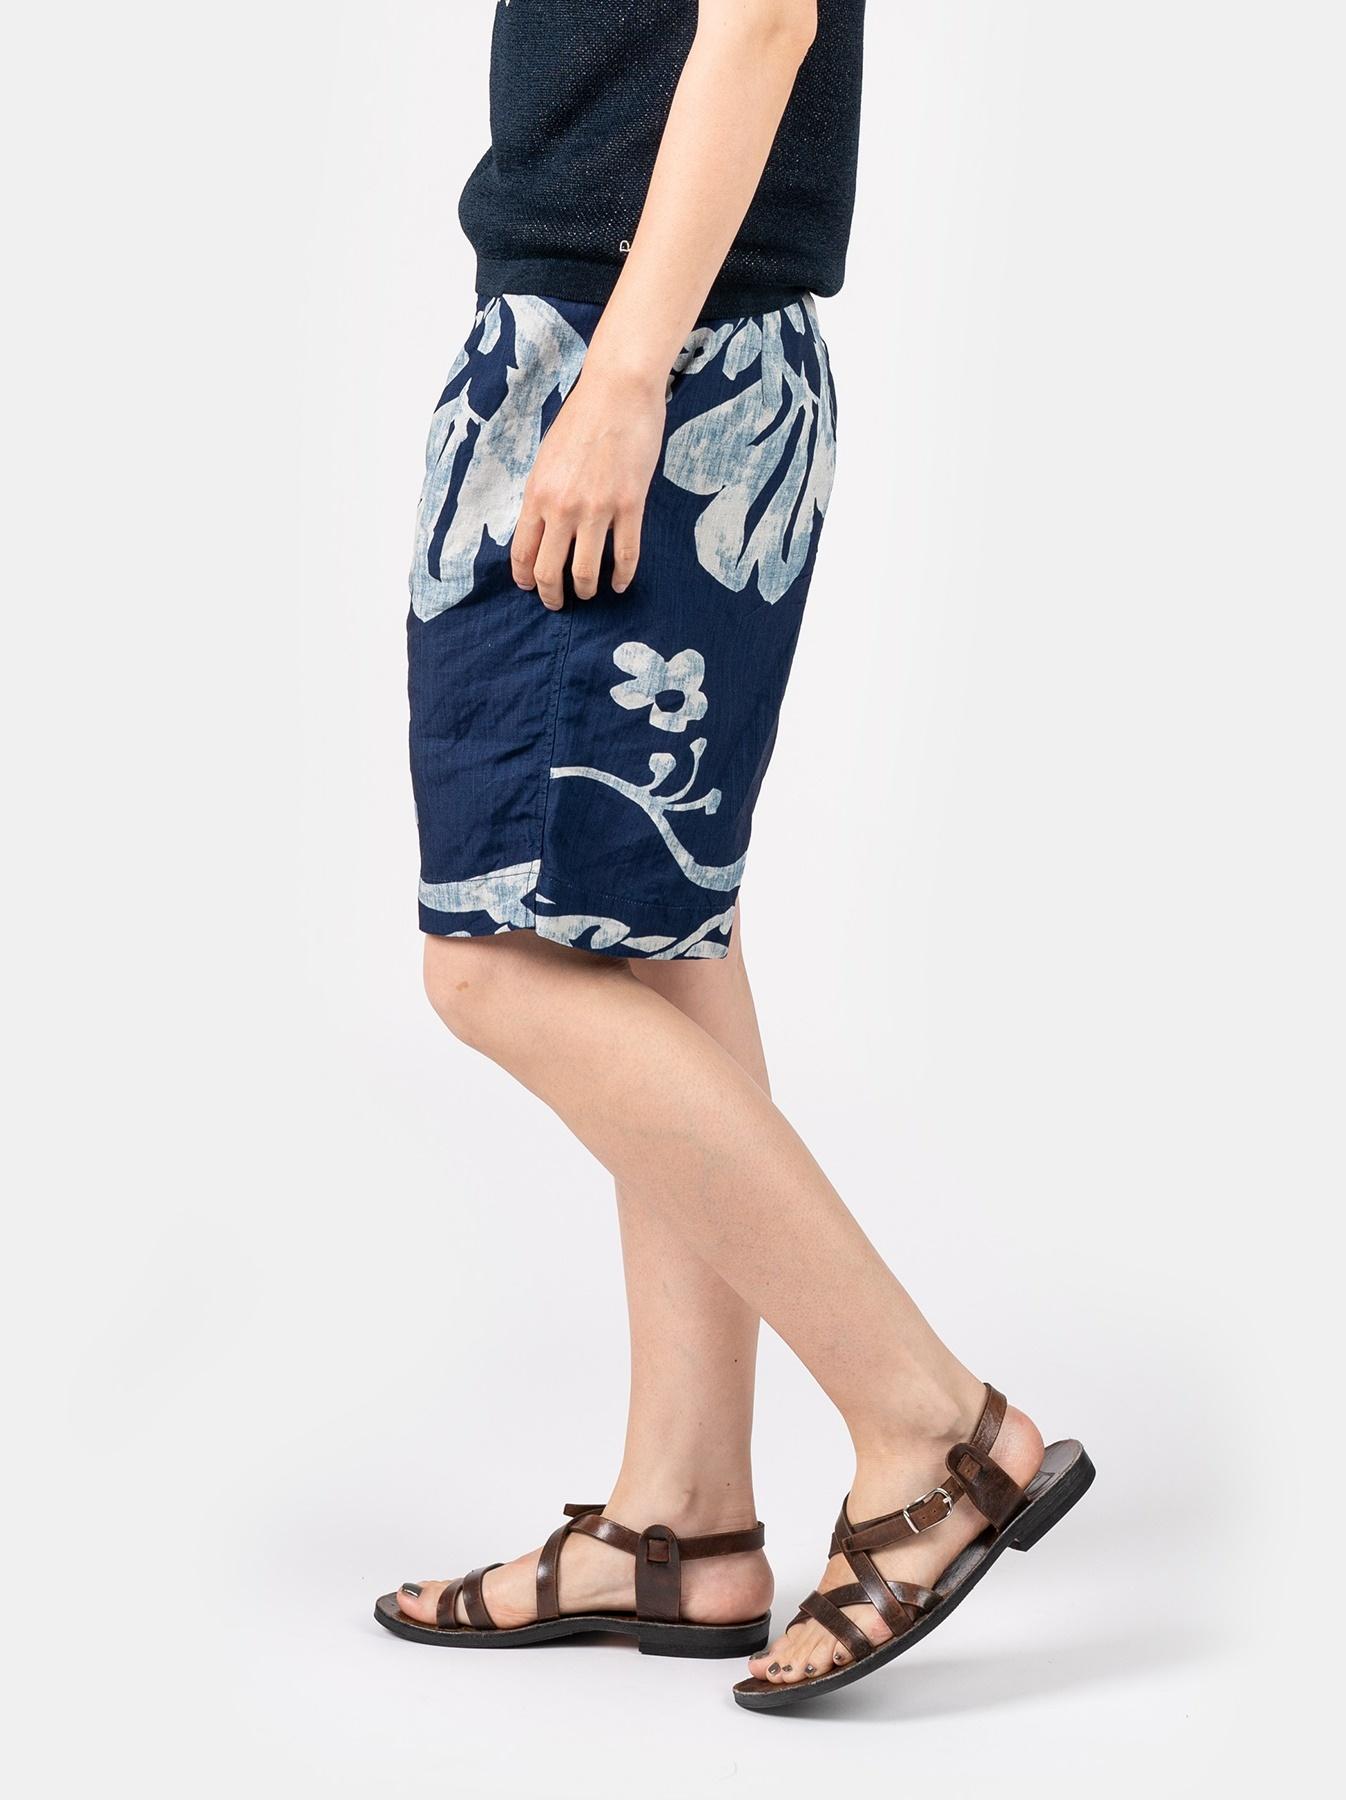 WH Indigo Linen Umiiloha 908 Short Pants-8